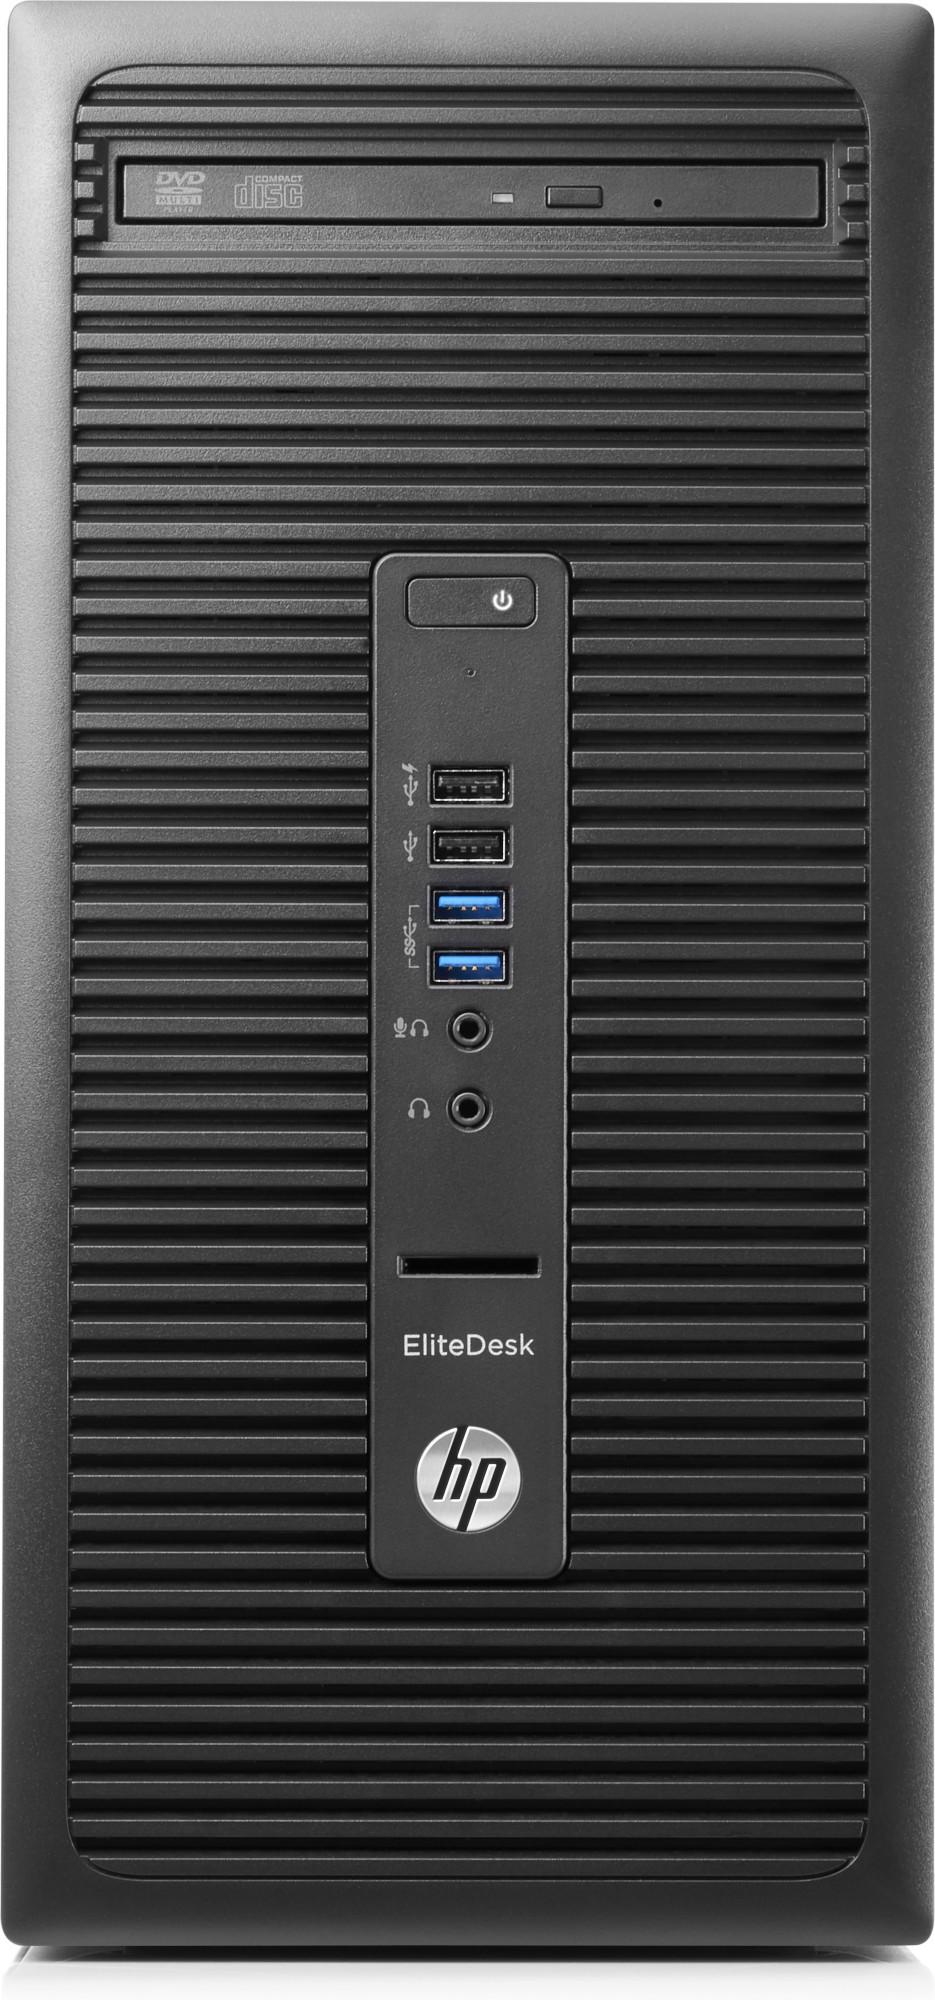 HP EliteDesk 705 G3 Microtower PC